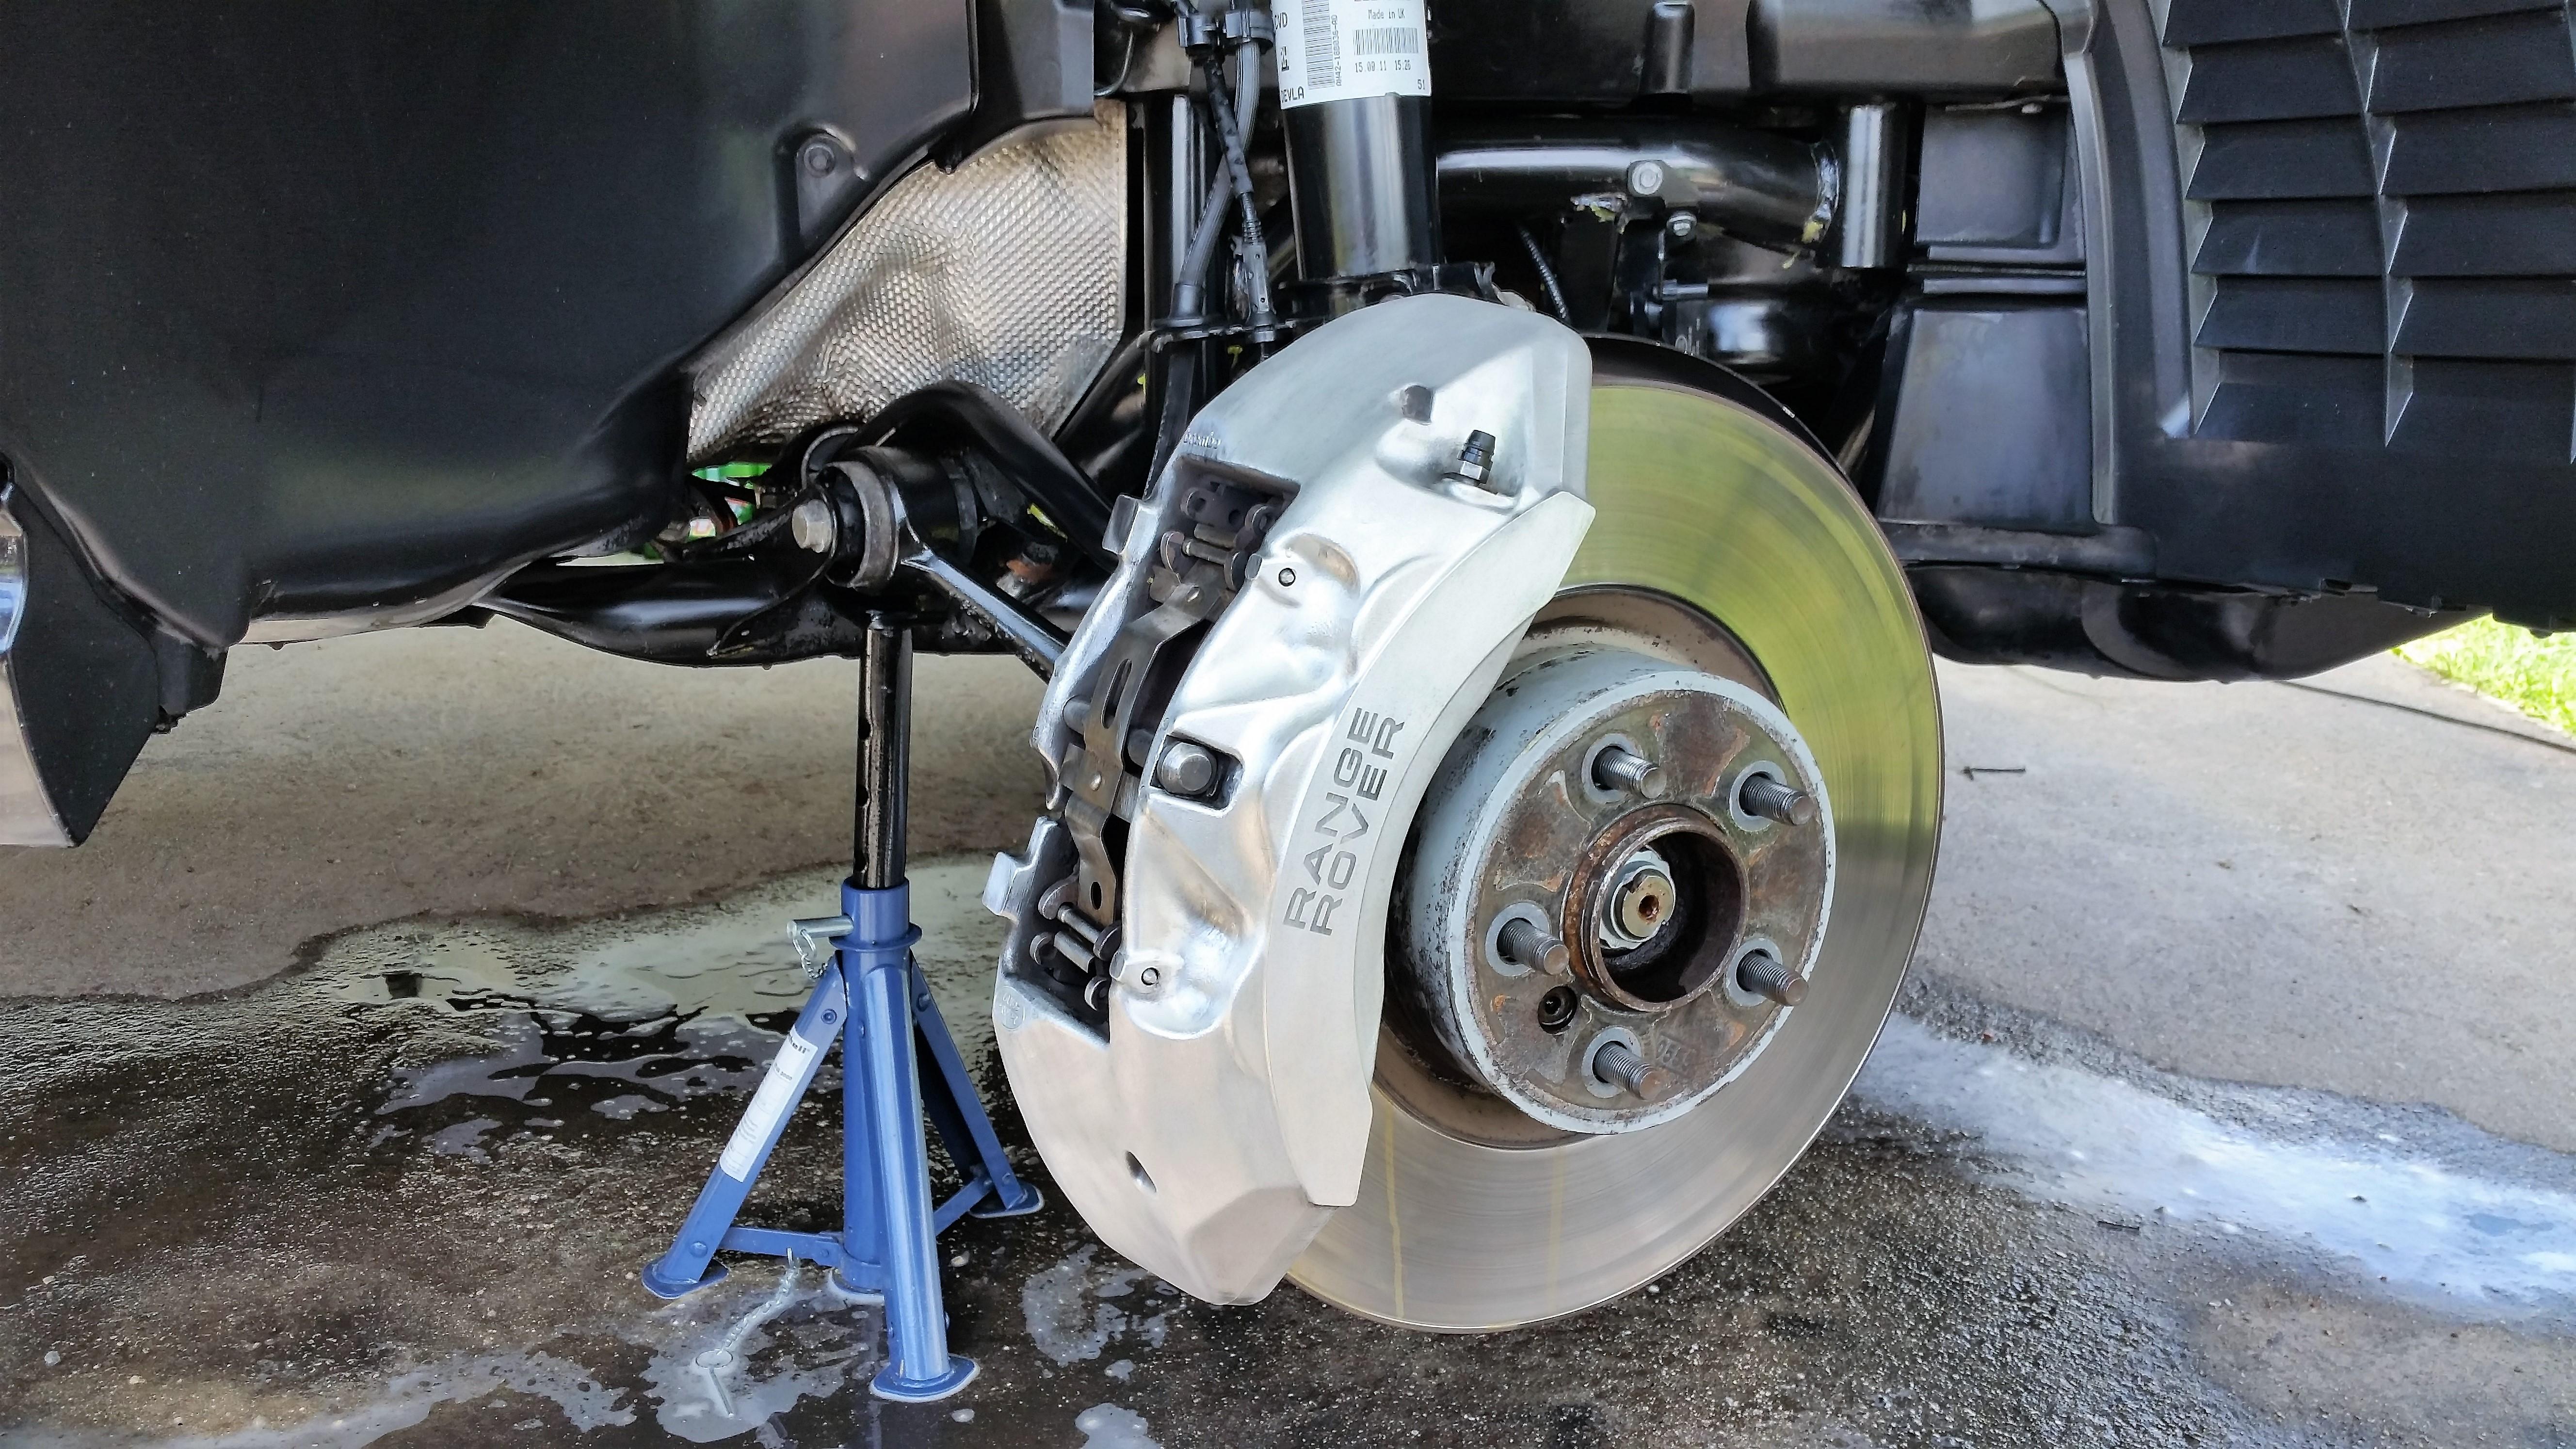 2010-2012 Range Rover S/C - Brake Pad Life & Suggestions-20160401_123918-1-2-.jpg